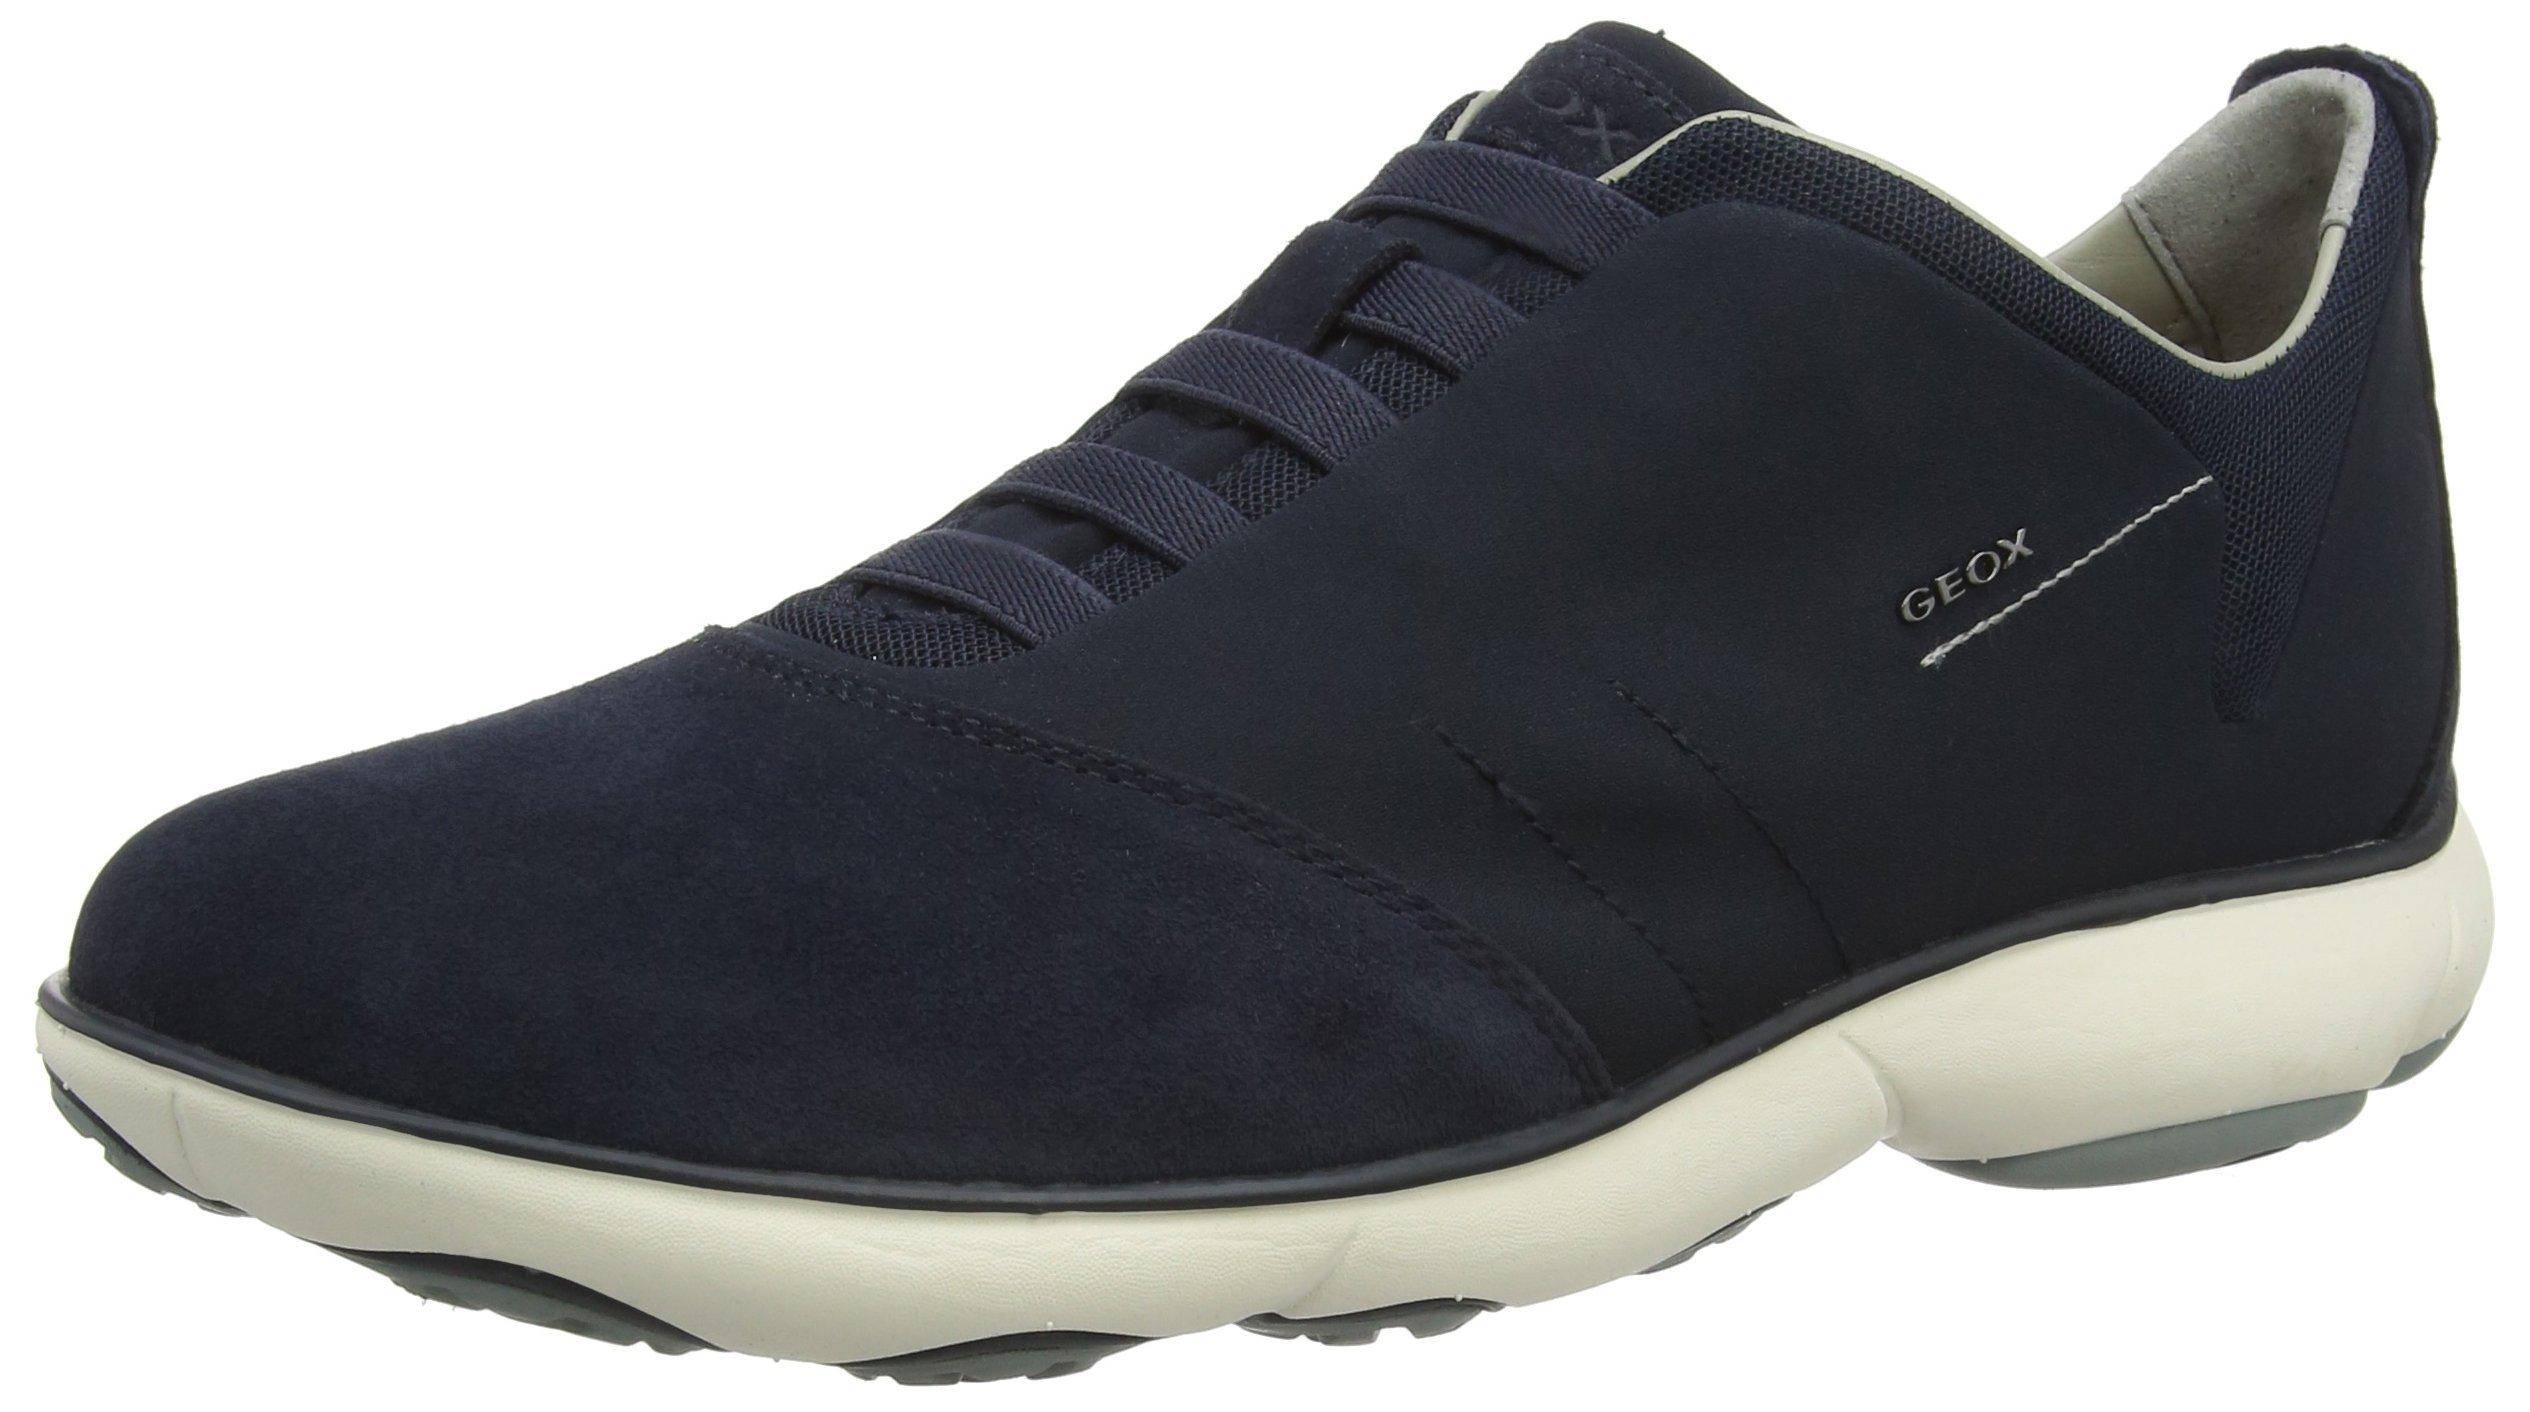 Geox U Nebula B Sneaker Uomo Blu Navyc4002 42 EU - mainstreetblytheville.org f64b979a37b